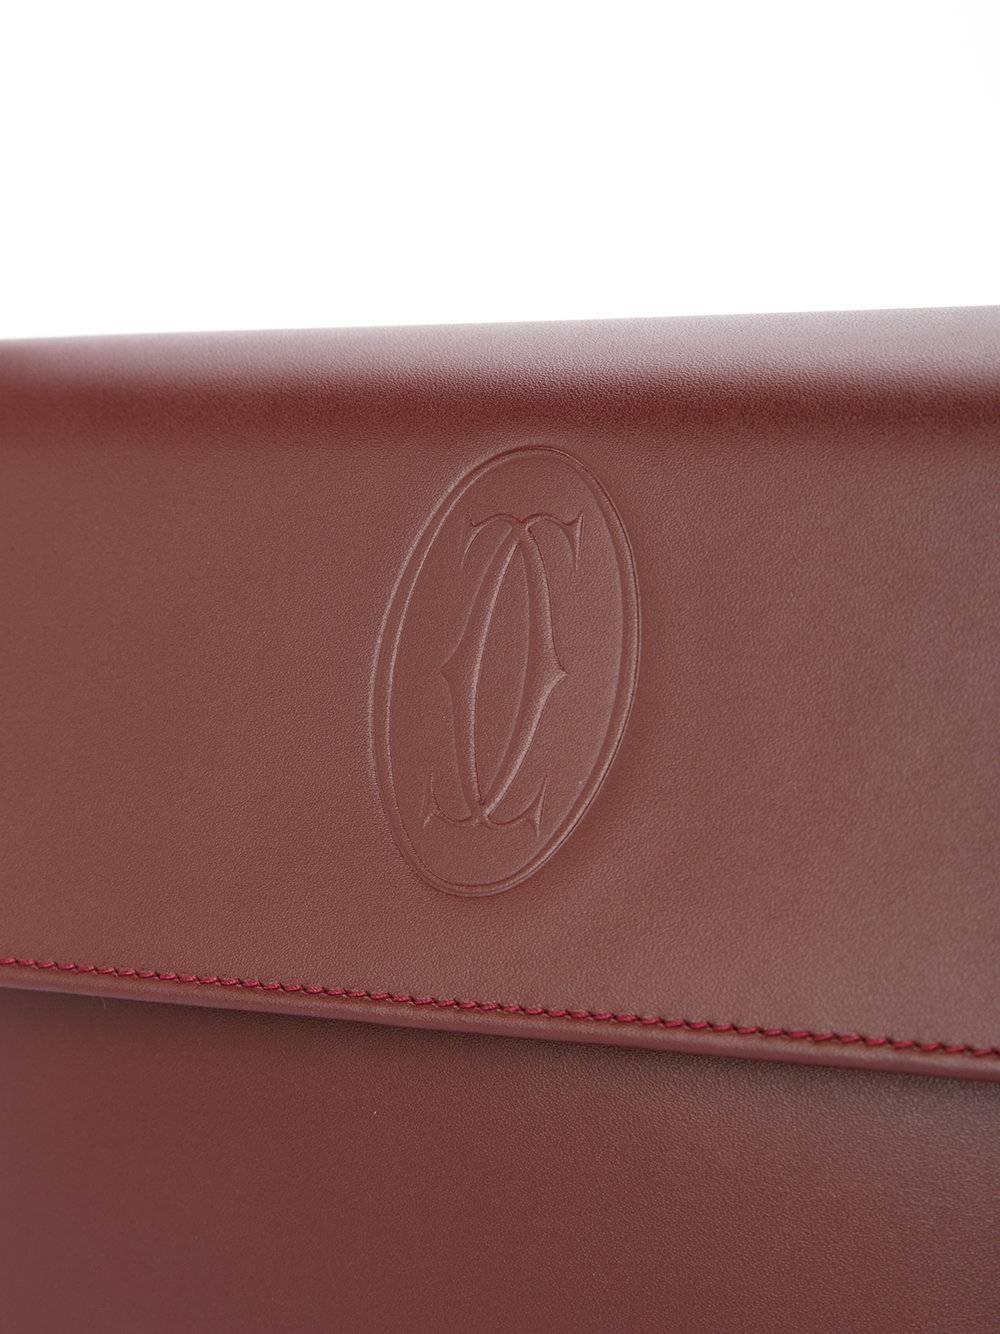 Cartier Burgundy Bordeaux Leather Gold Evening Envelope Flap Clutch Bag mlceBR5